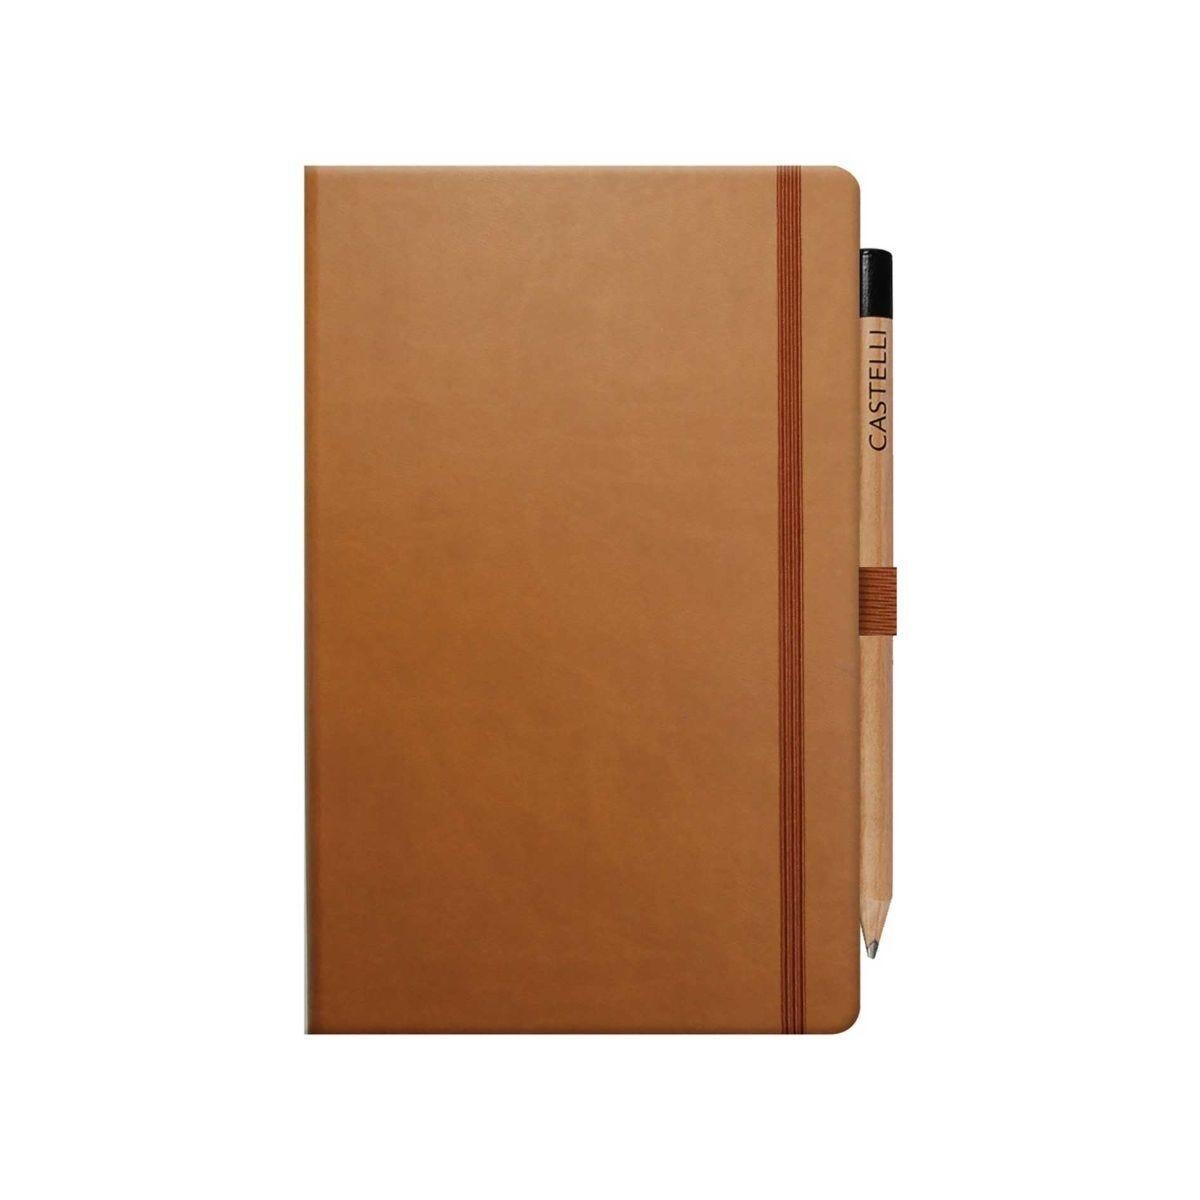 Castelli Ivory Tuscan Notebook Medium Ruled Plus Pencil Chestnut